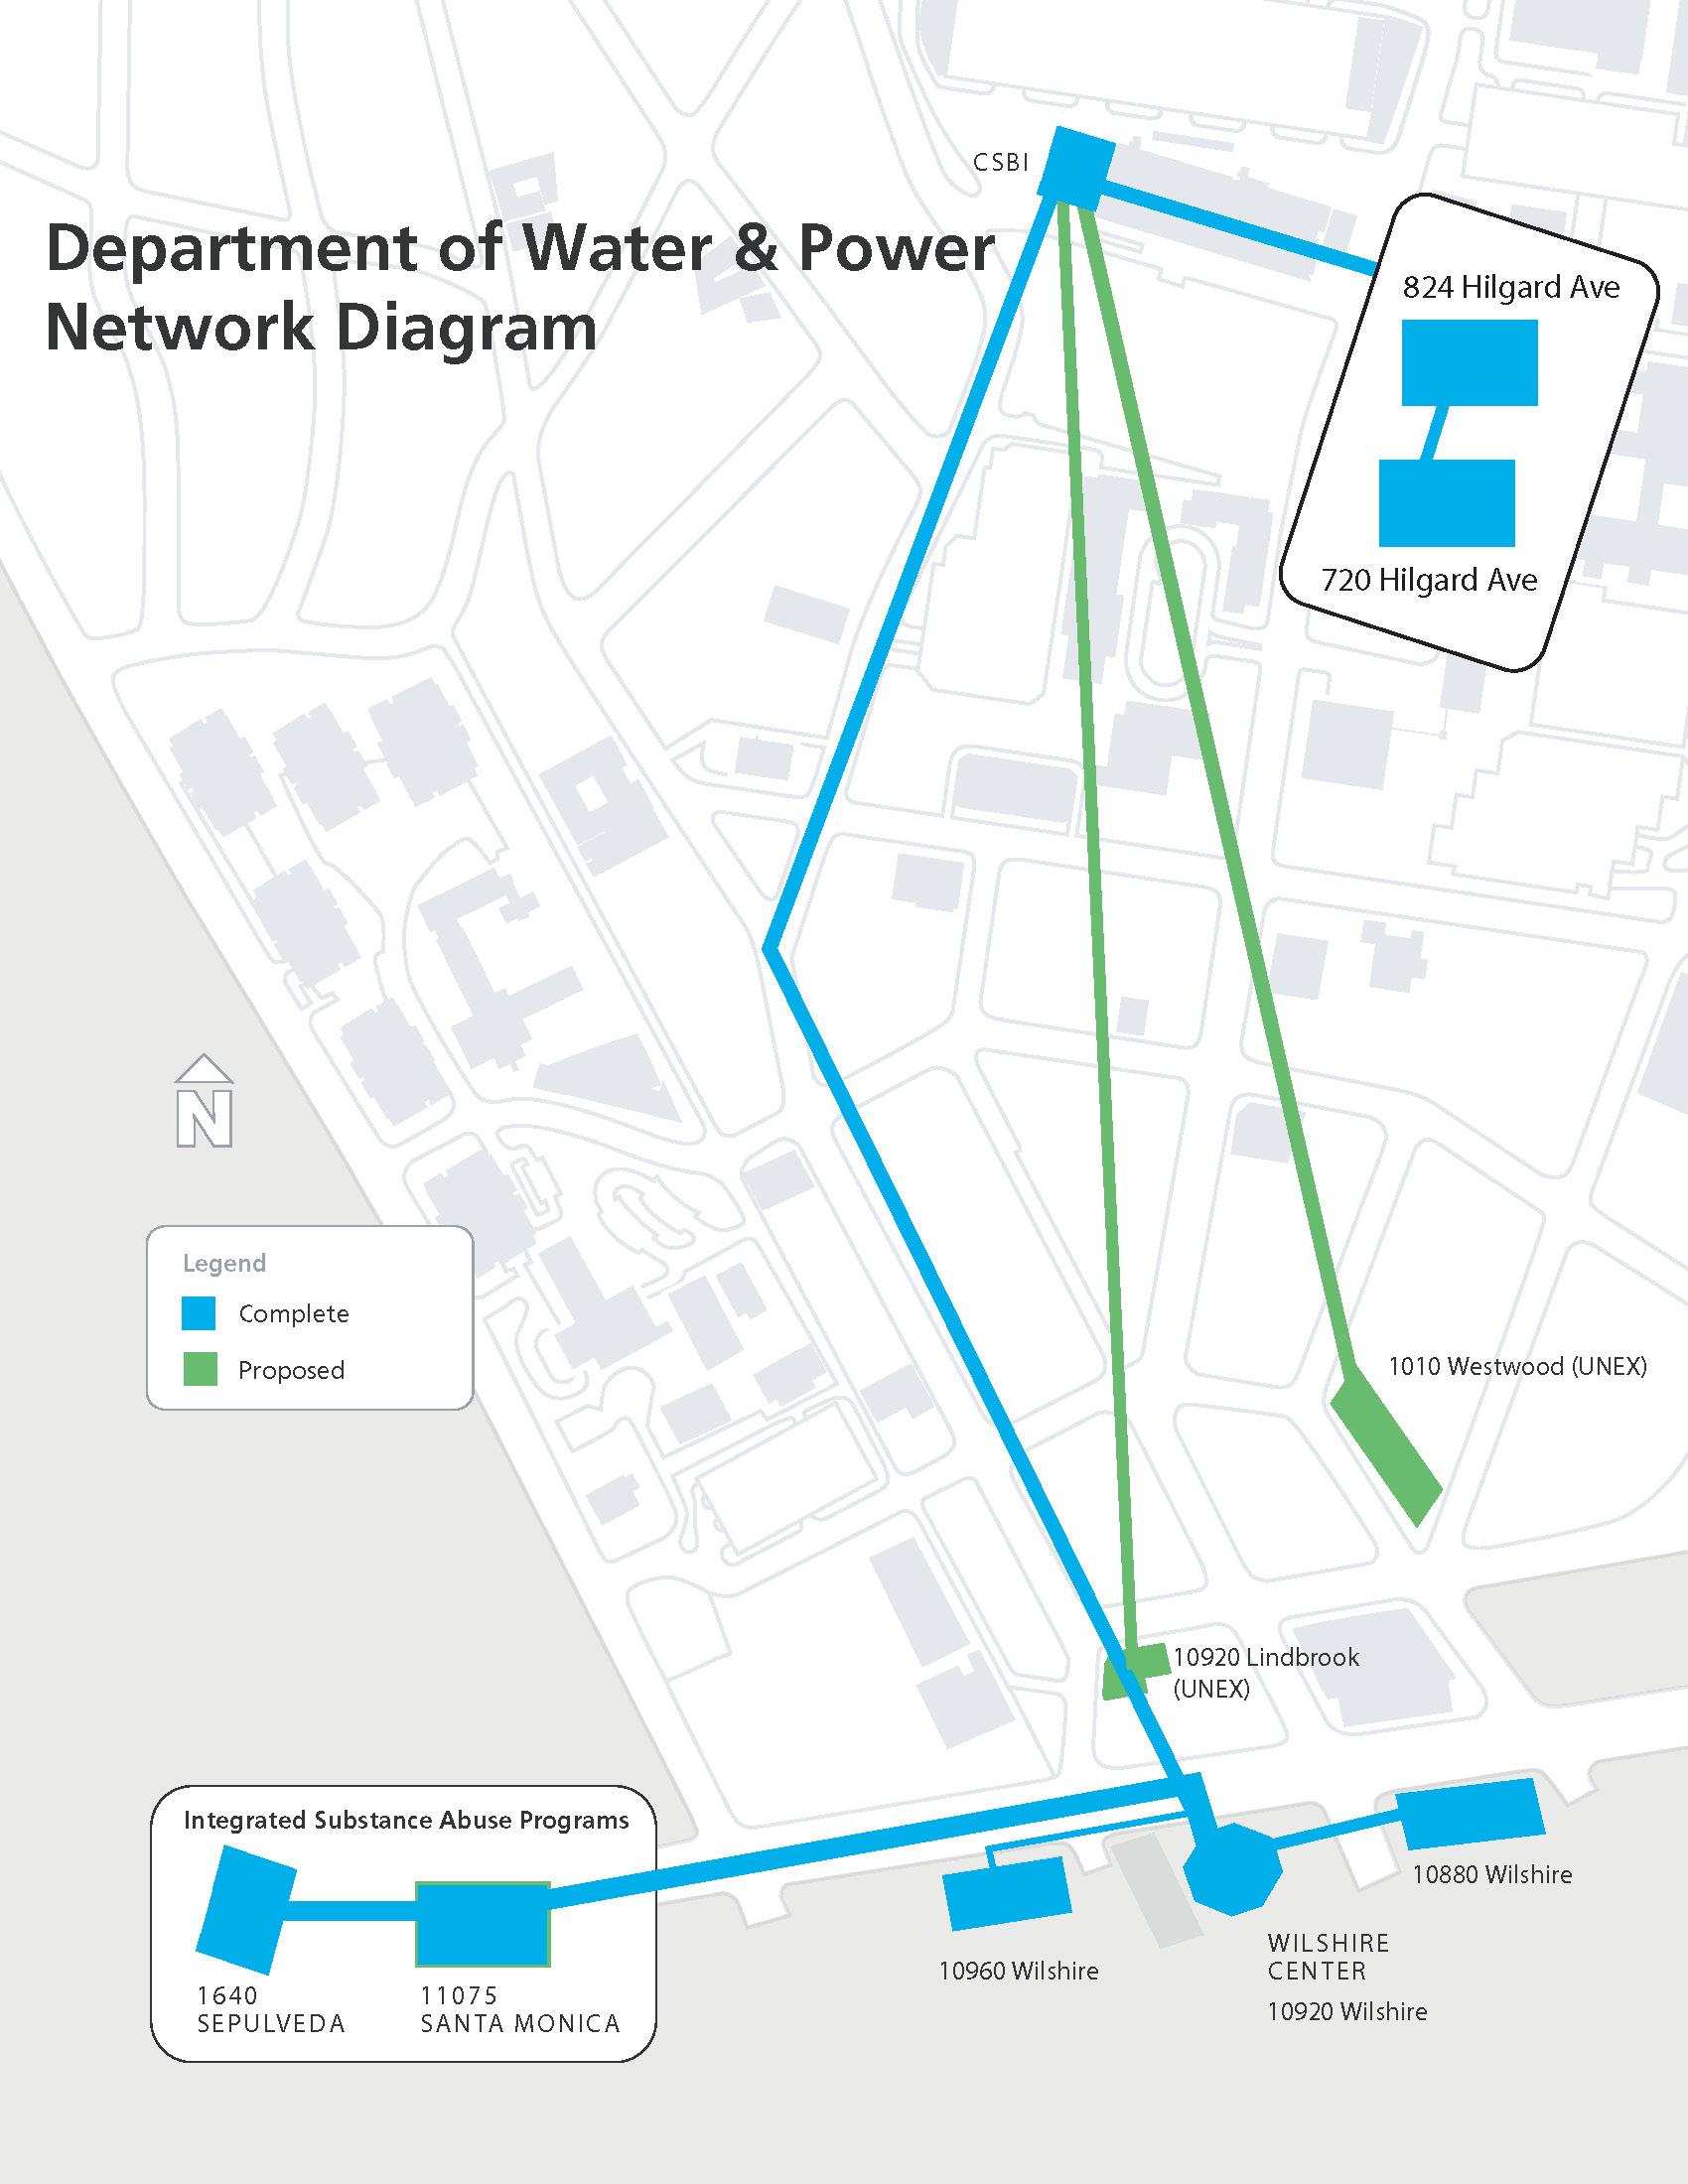 IPS 08 10-11 dwp network diagram.jpg